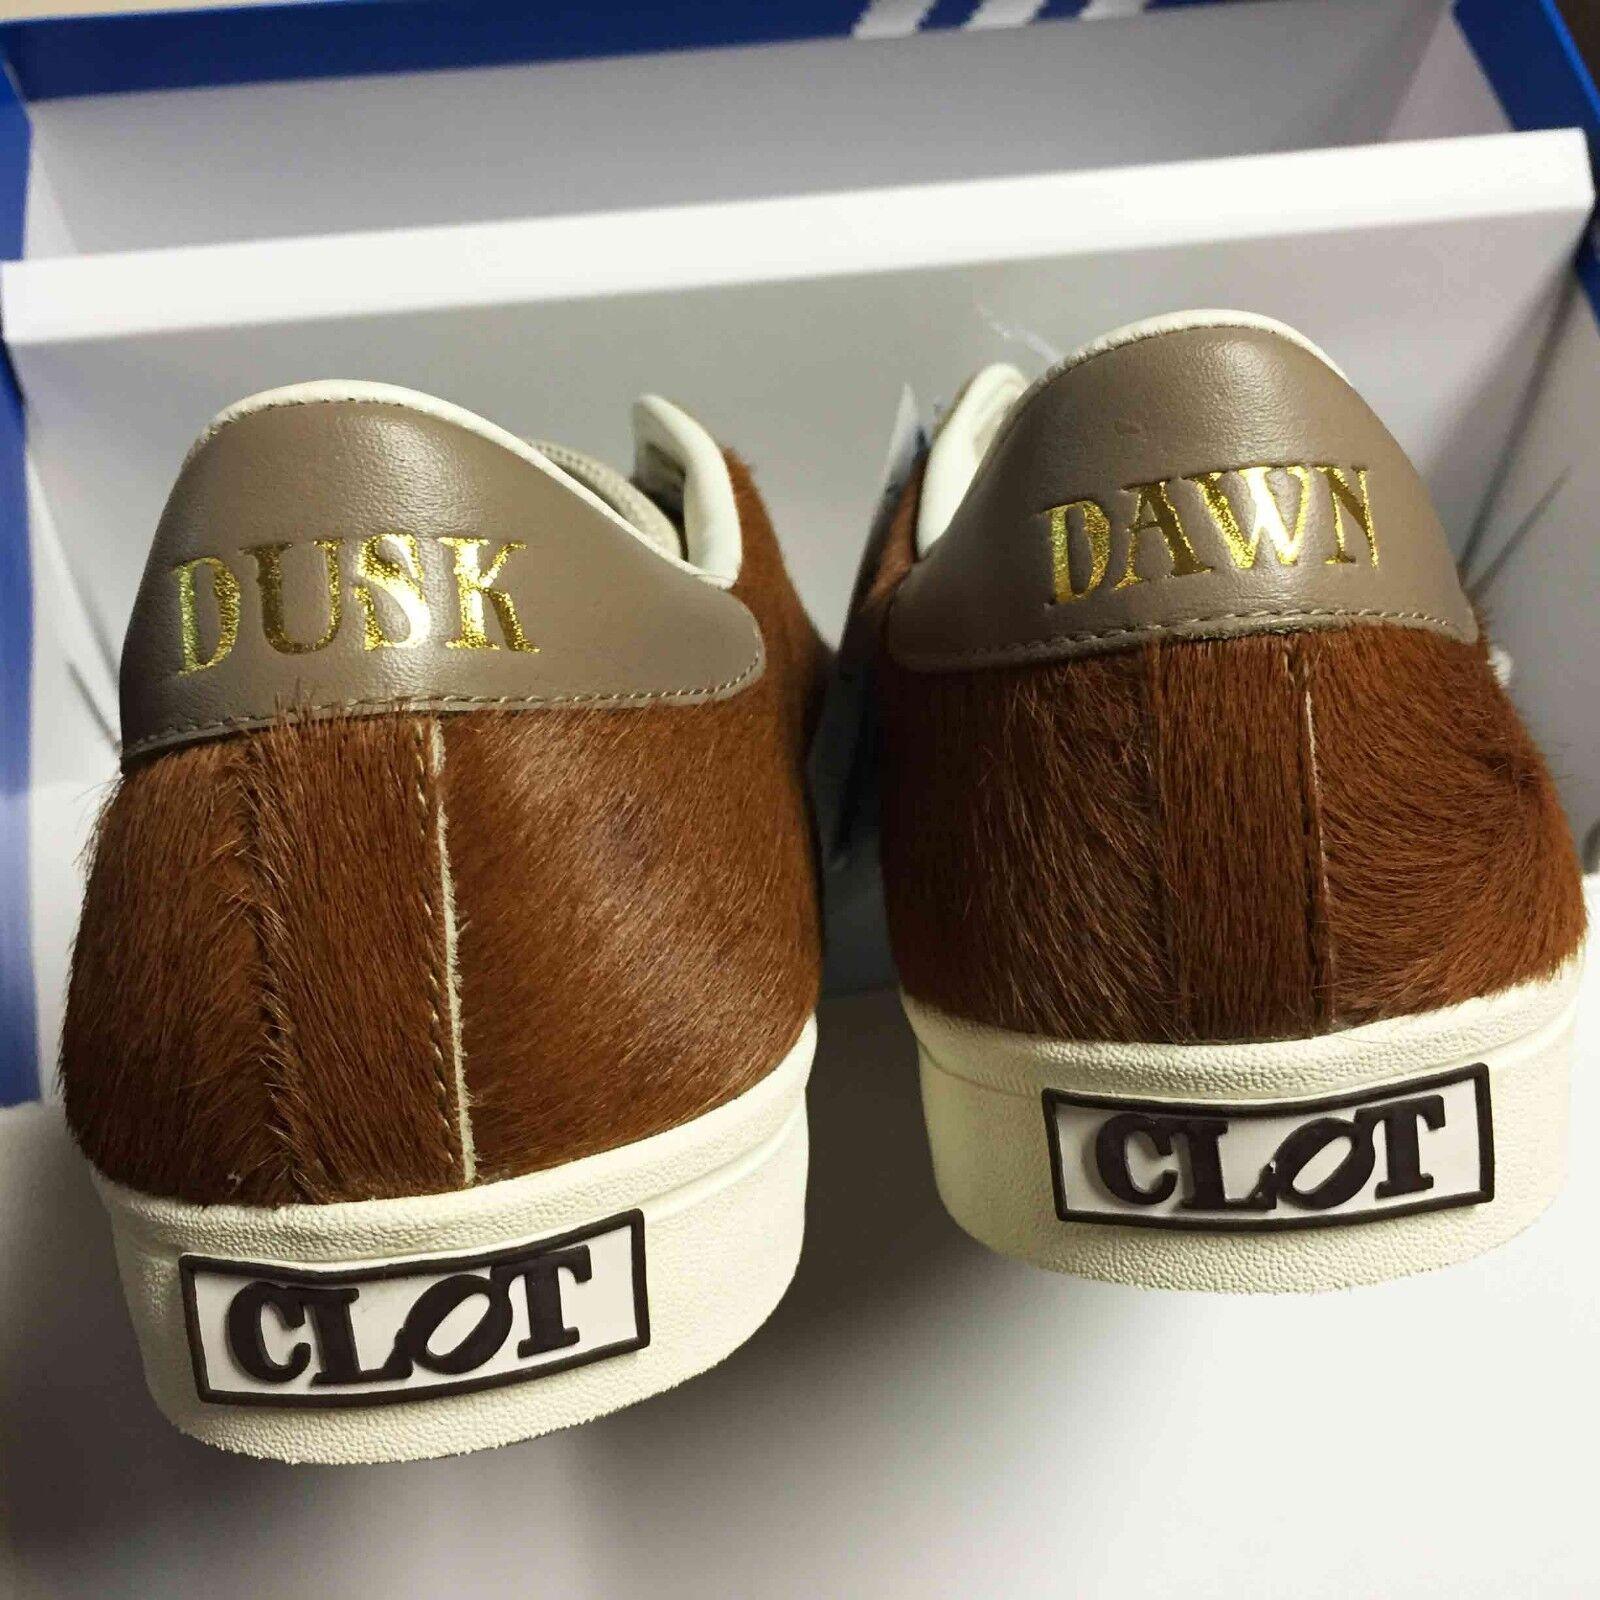 180 Adidas x CLOT ACU Rod Laver Vintage Stan Smith Pony Hair Consortium G15461